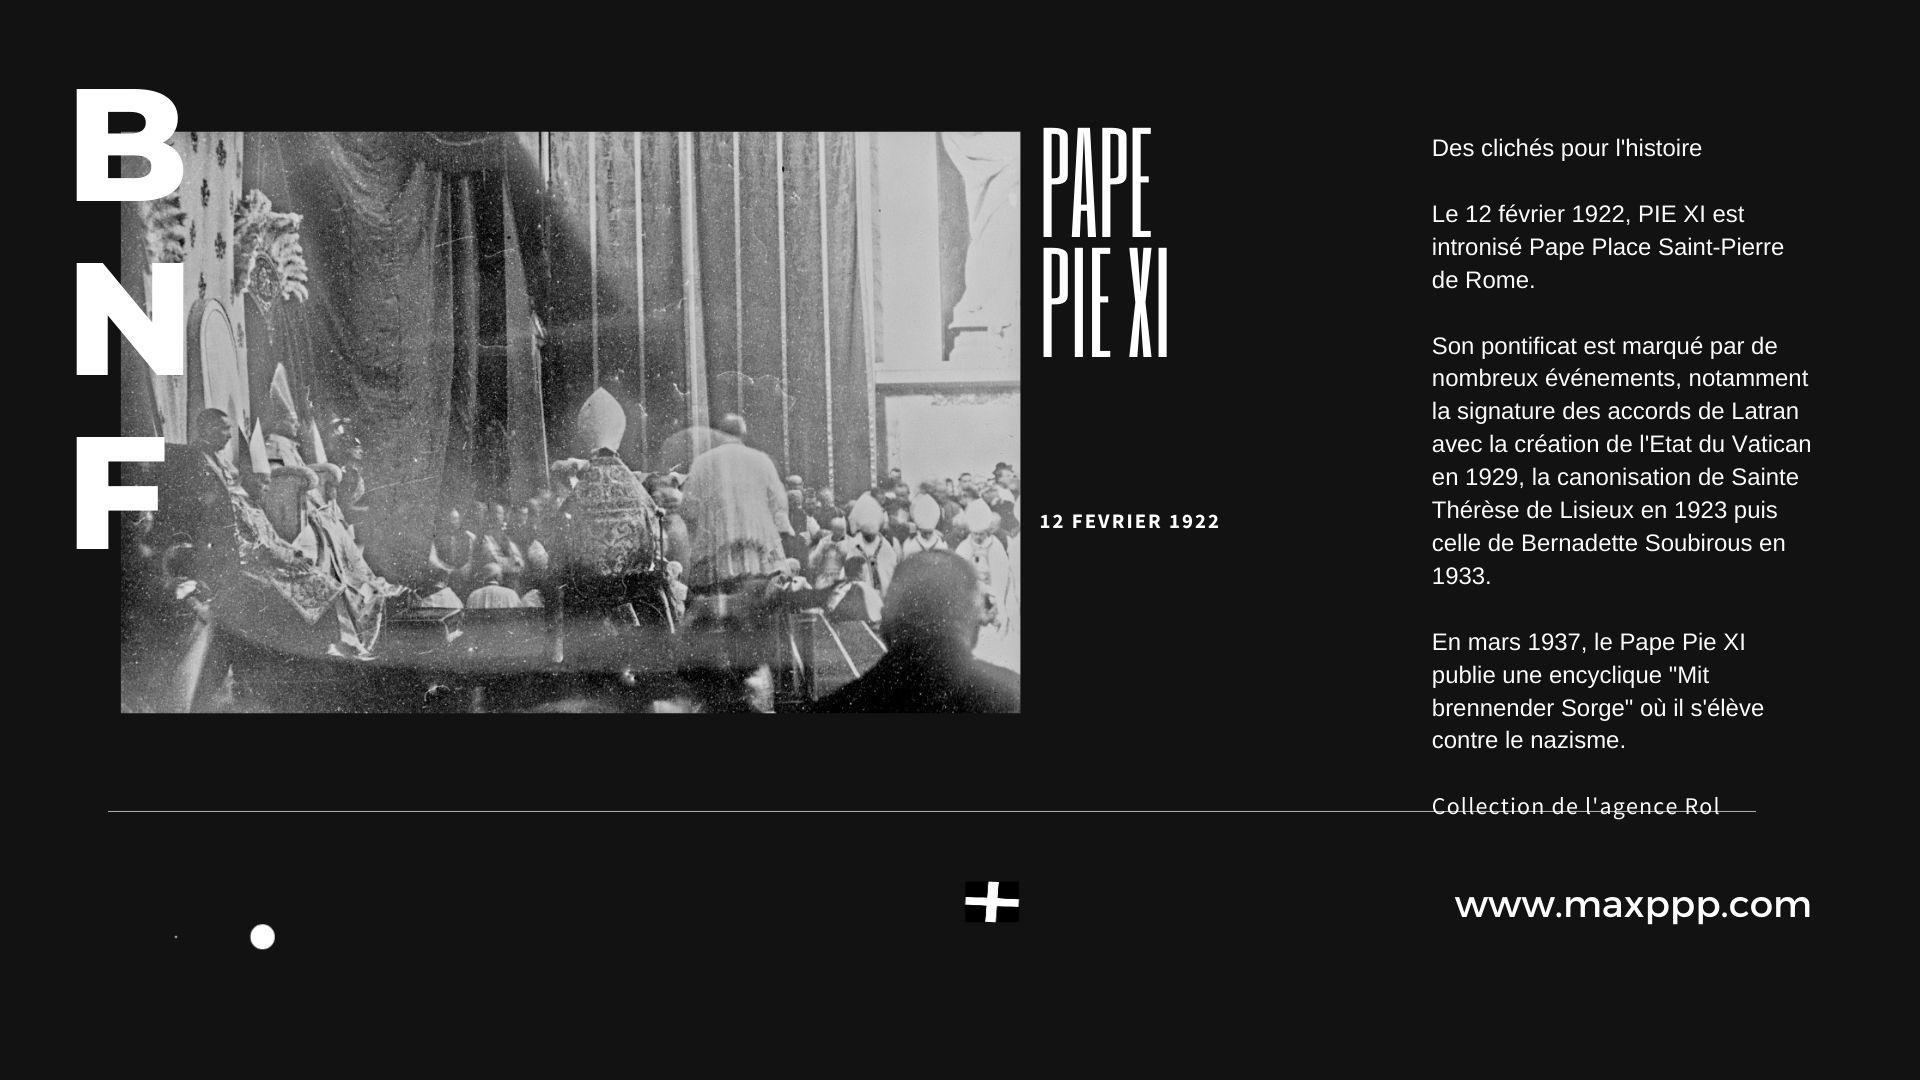 Intronisation Pape Pie XI